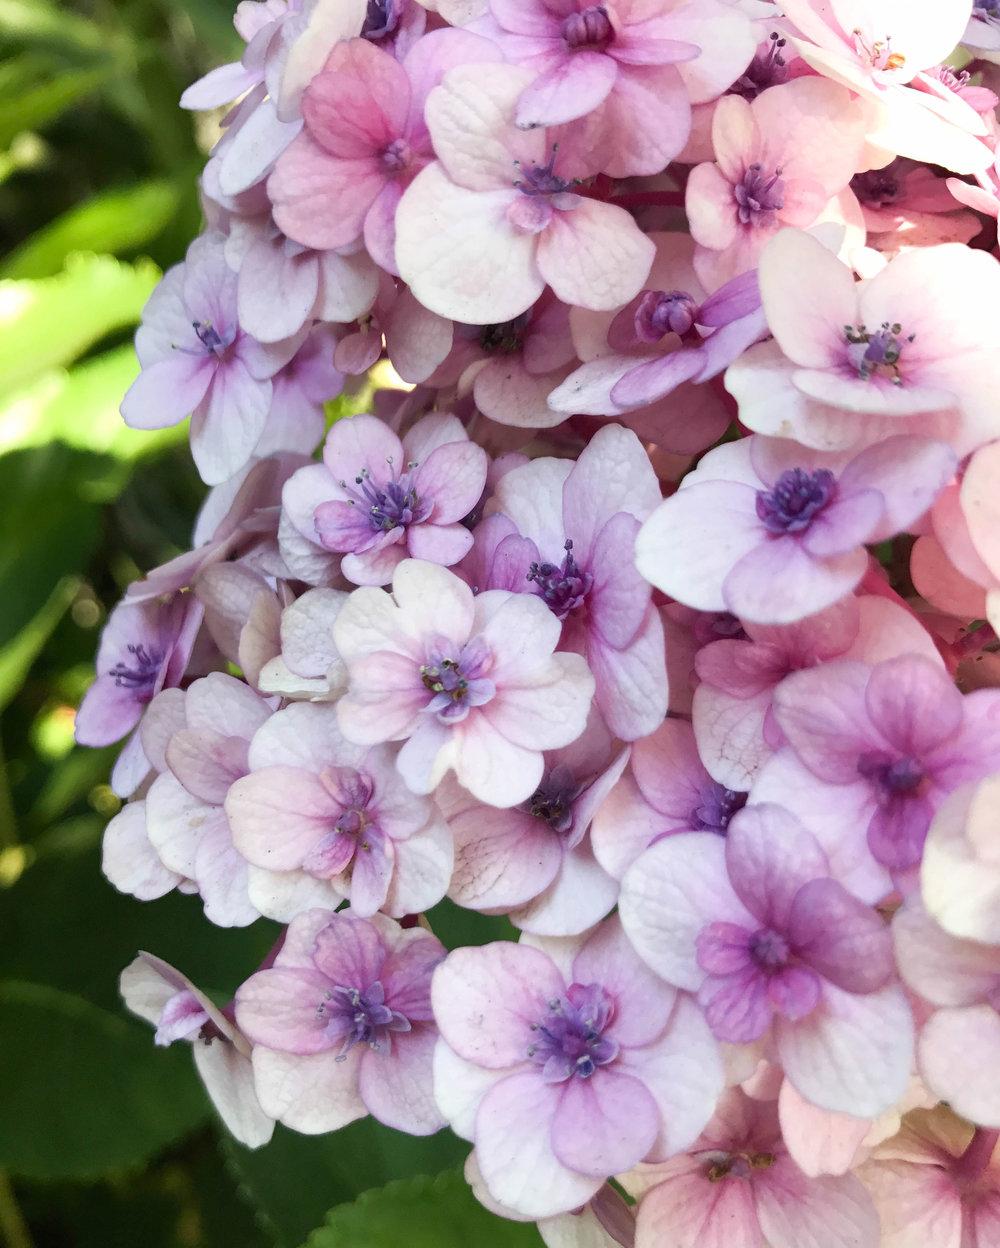 flowers_western_cape.jpg